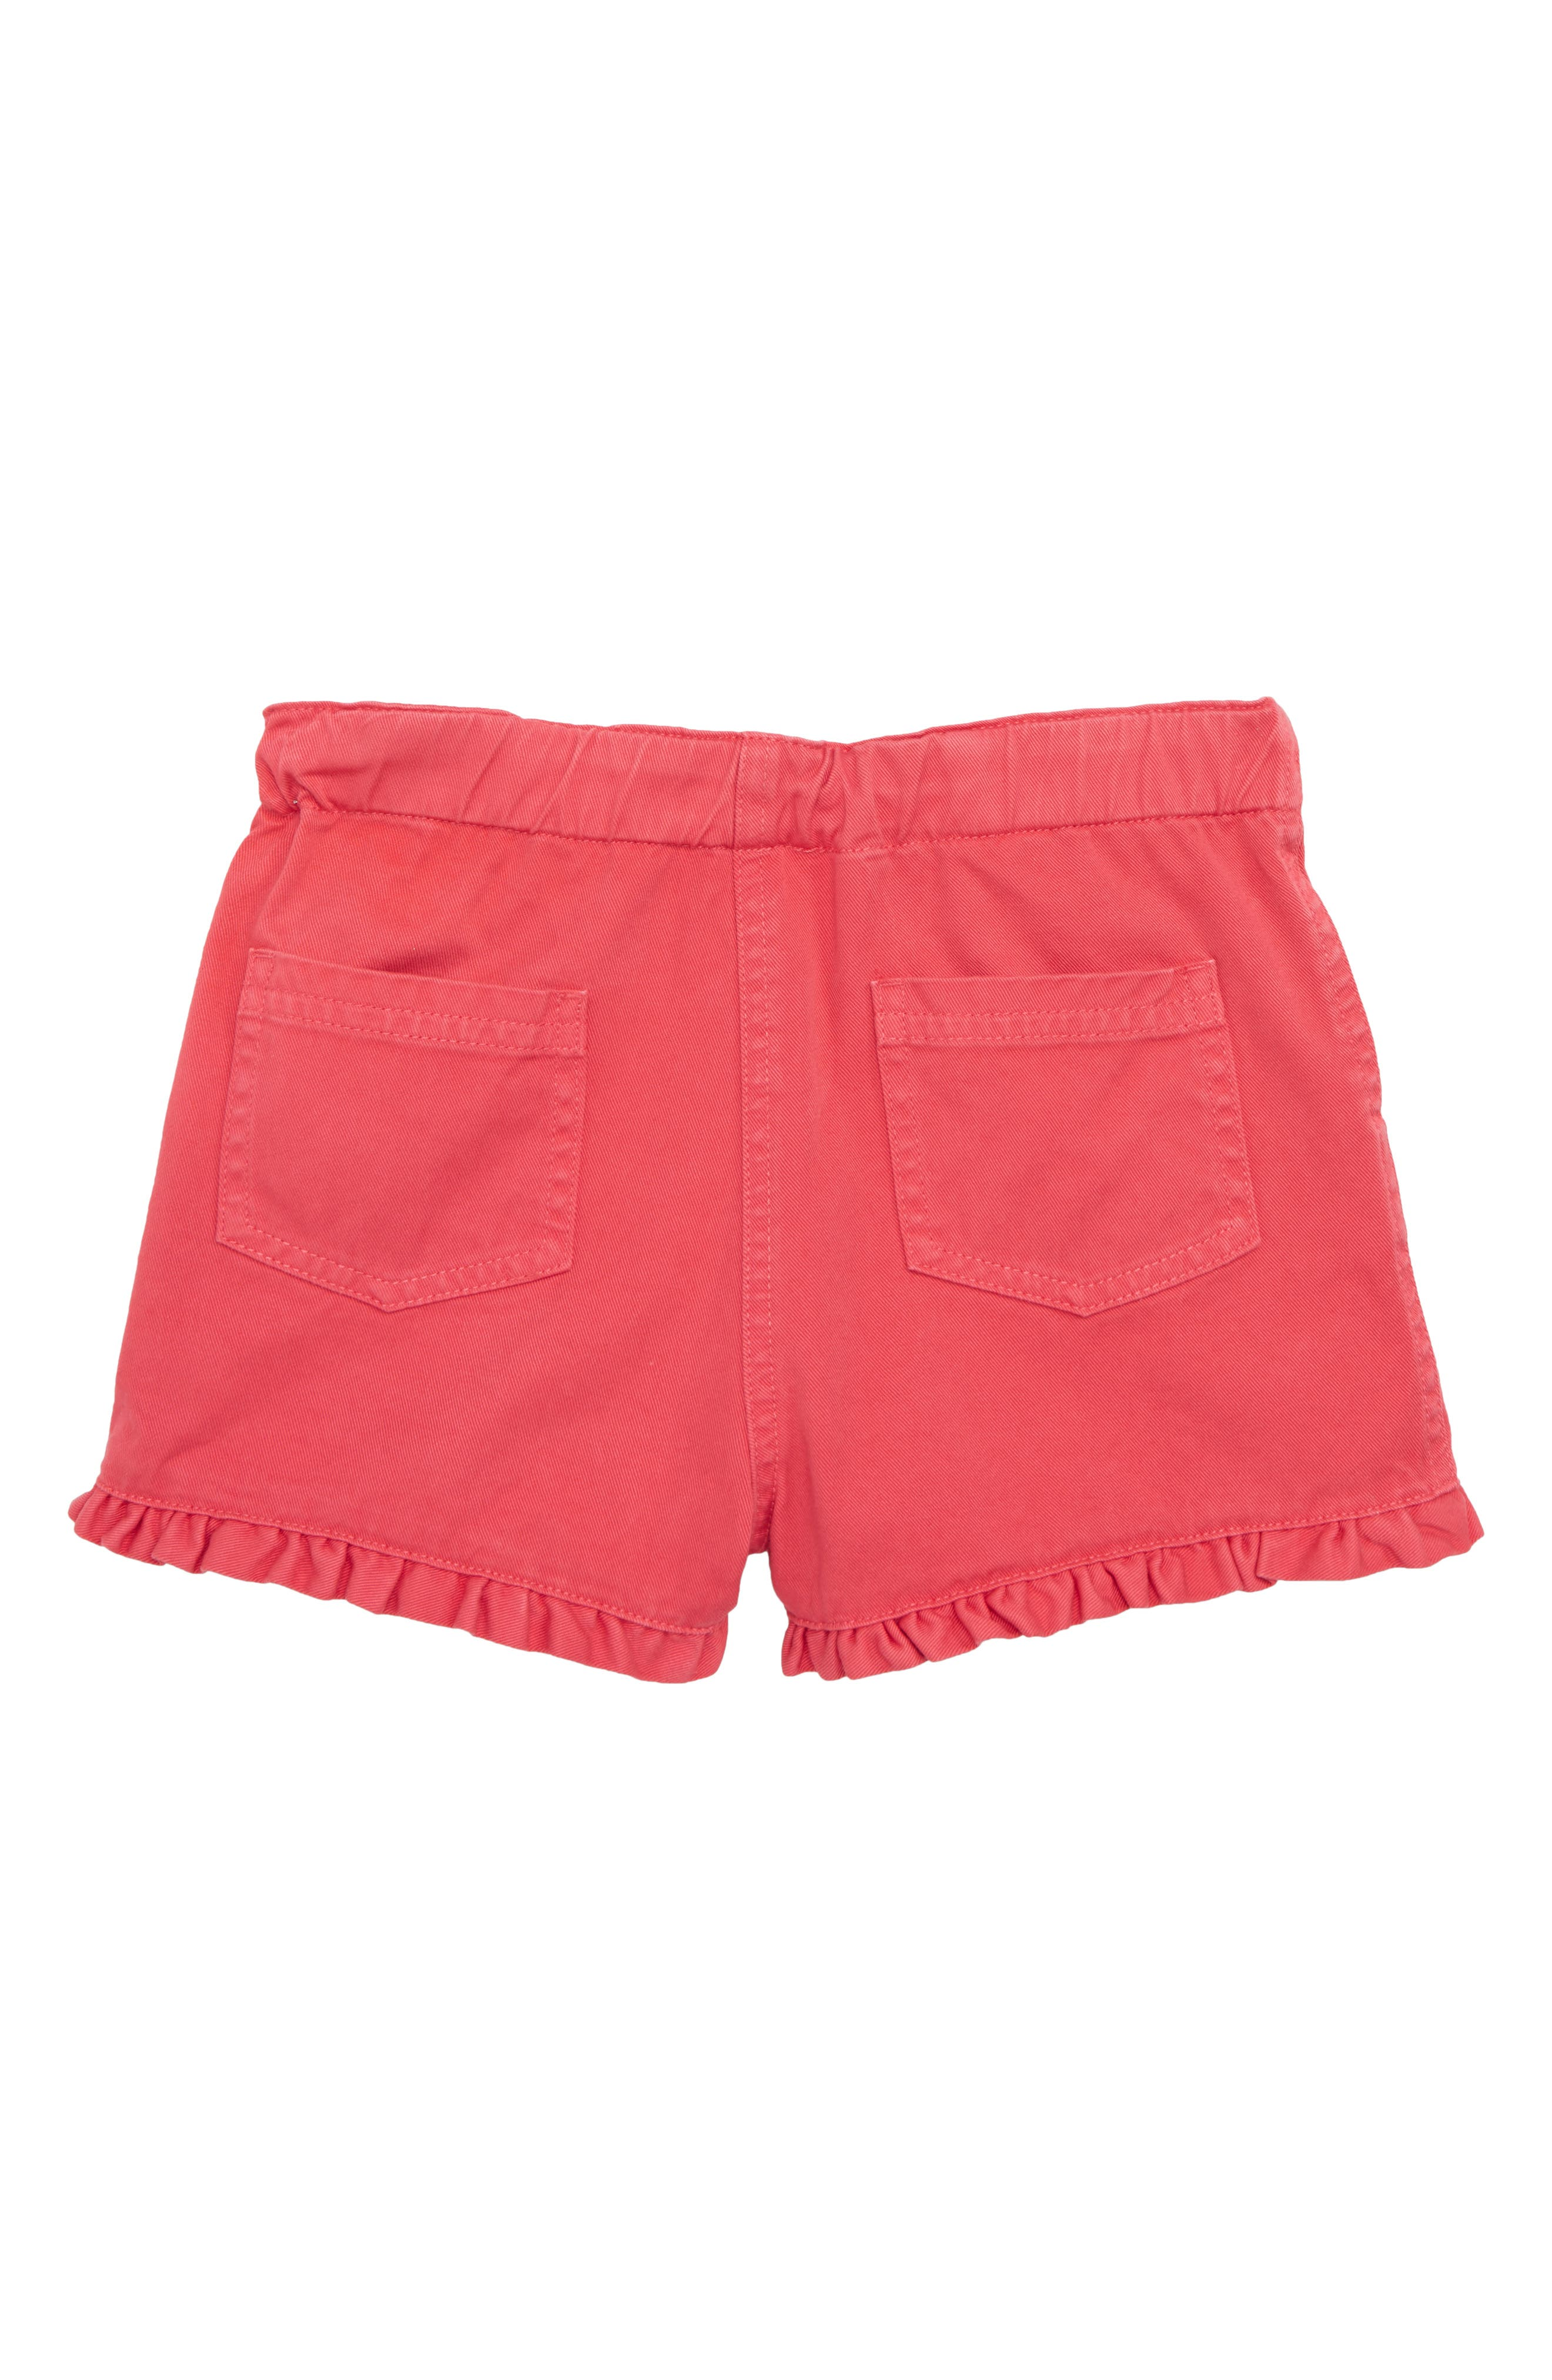 Frill Detail Shorts,                             Alternate thumbnail 2, color,                             Strawberry Split Pin